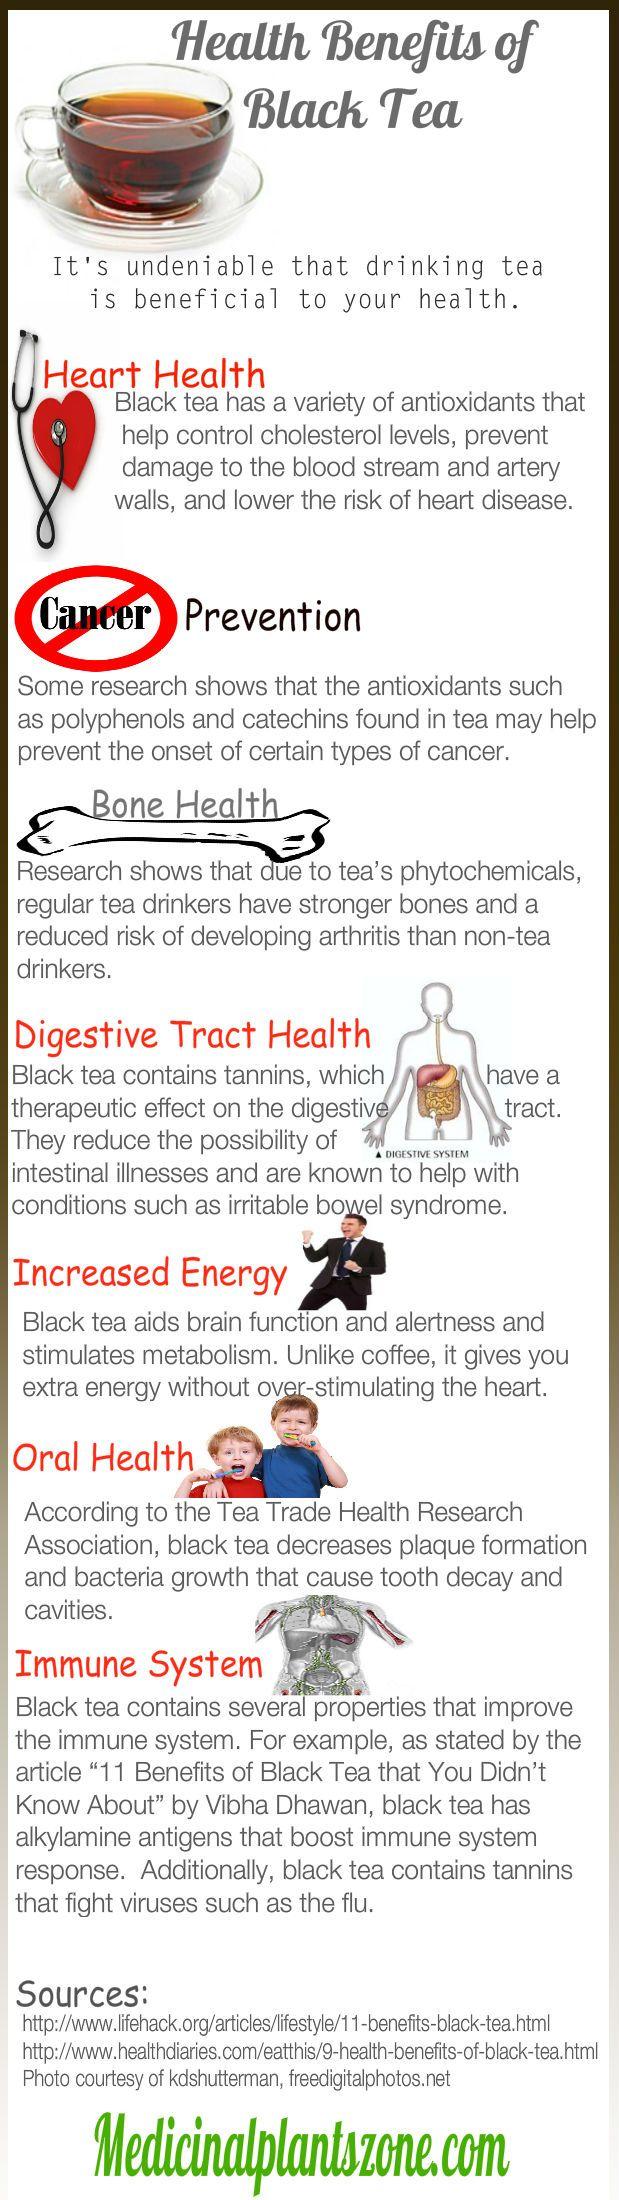 Health Benefits of Black Tea